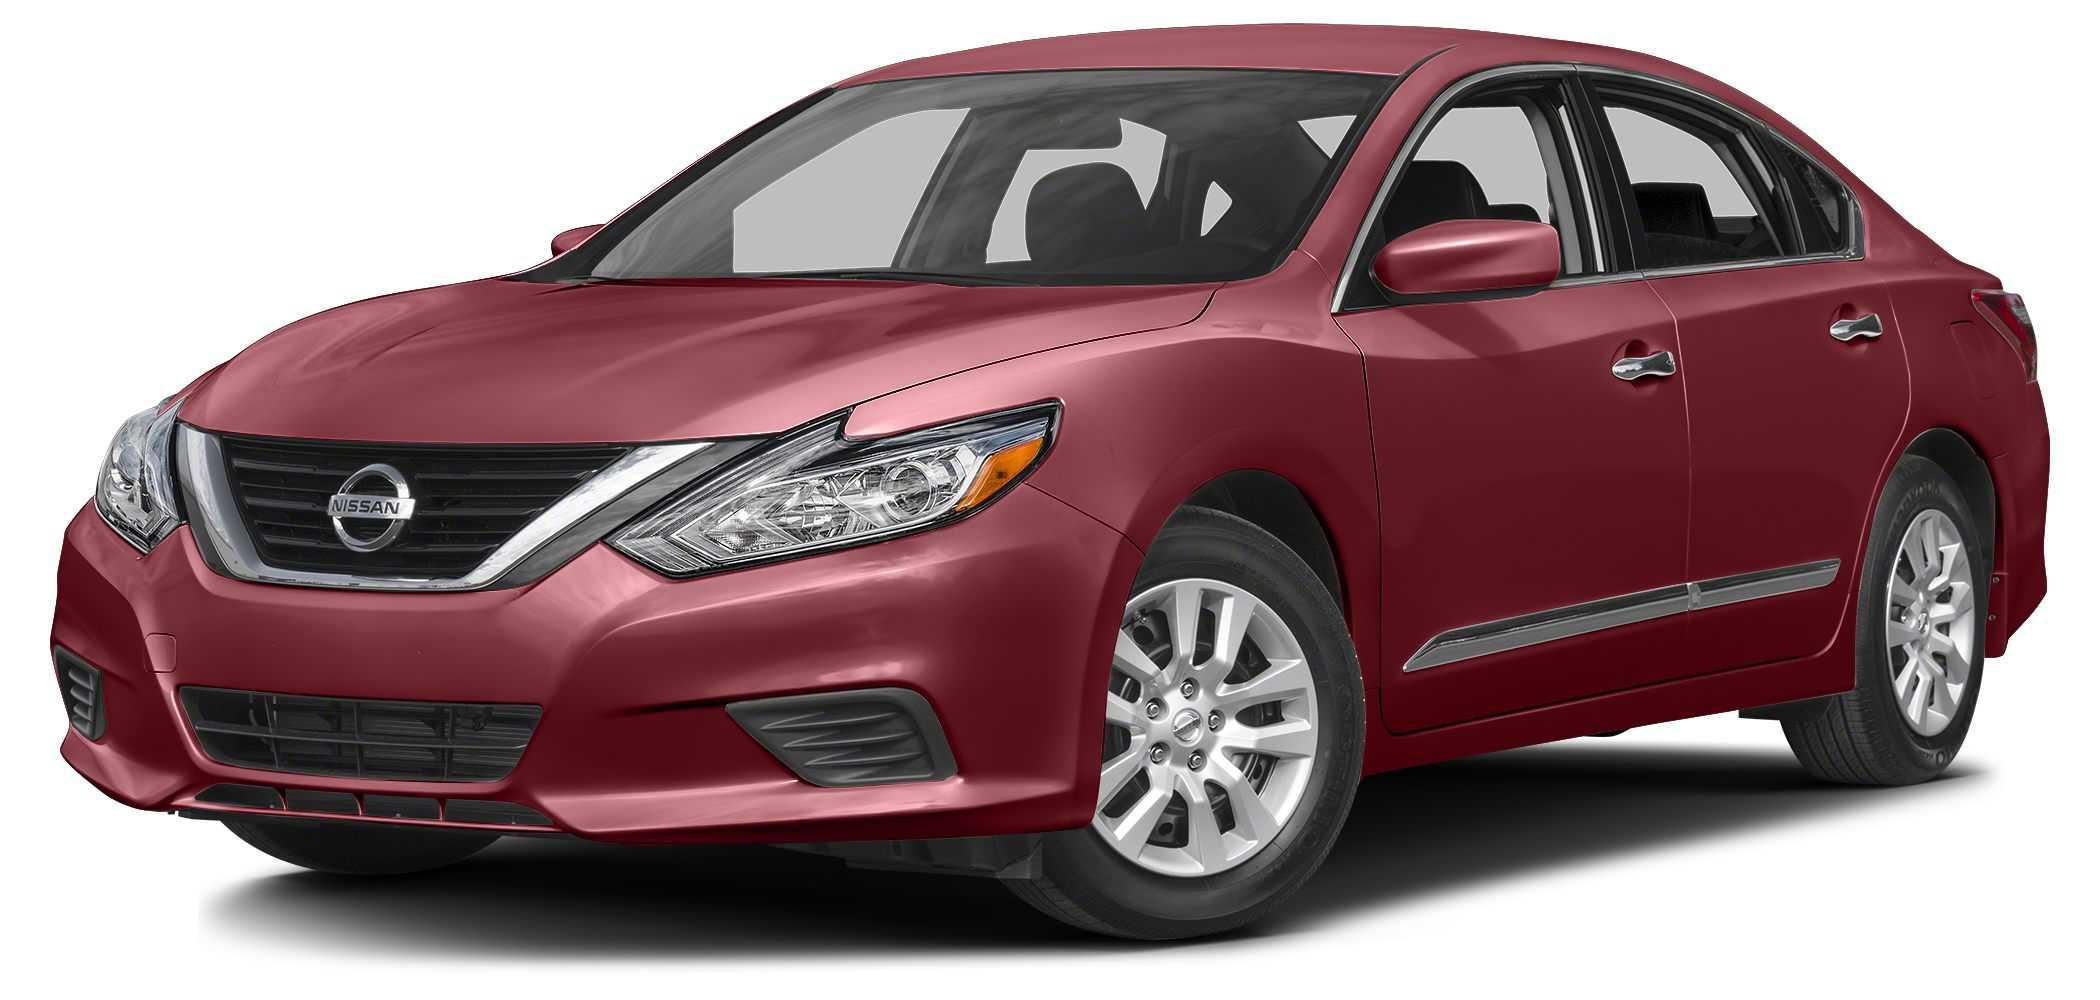 Tri cities nissan johnson city tn - 2017 Nissan Altima For Sale In Johnson City Tn 26955 00